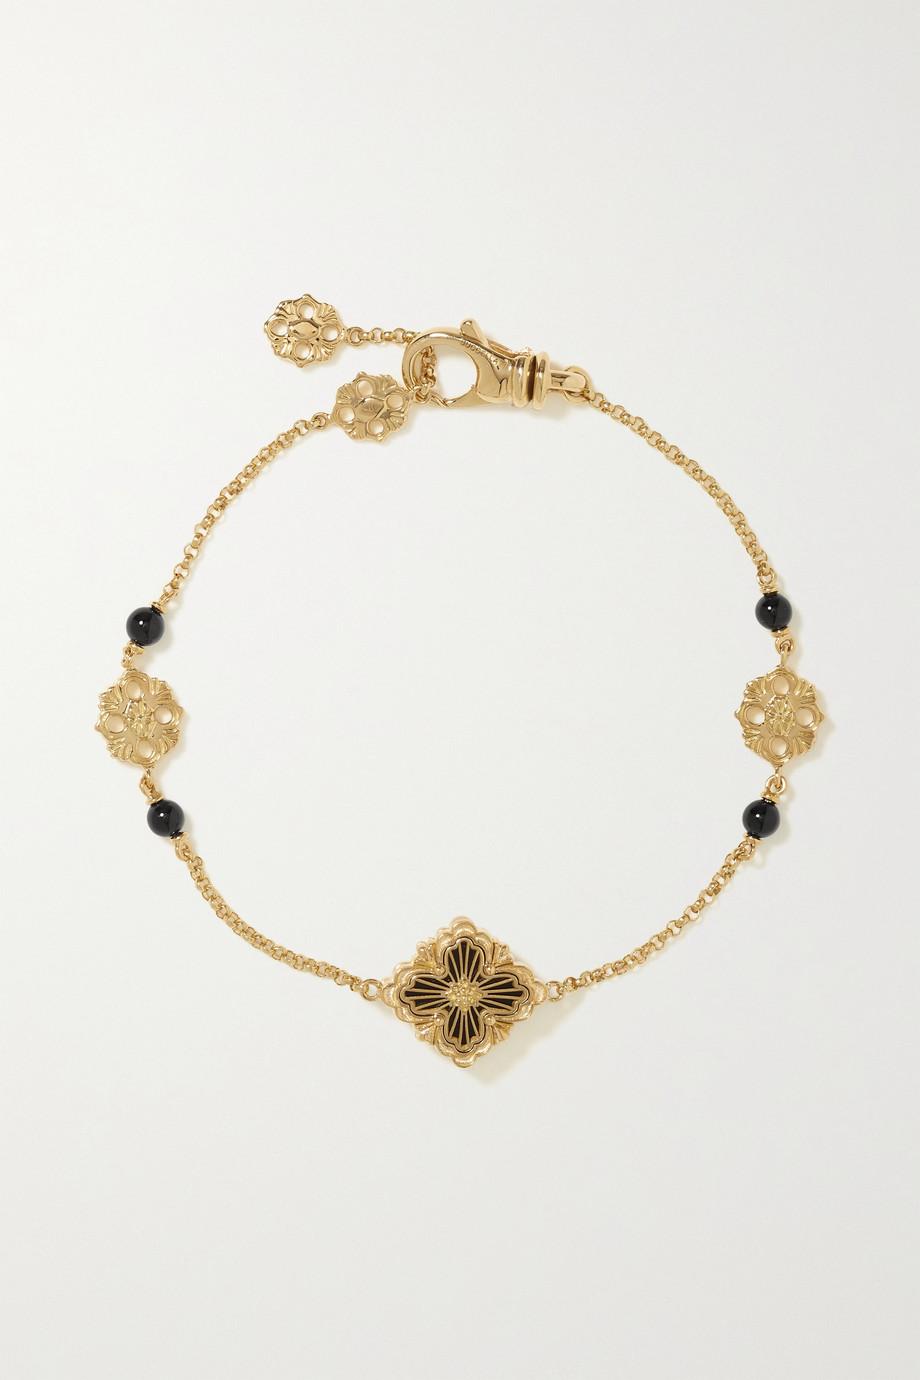 Buccellati Opera Tulle Armband aus 18 Karat Roségold mit Onyxen